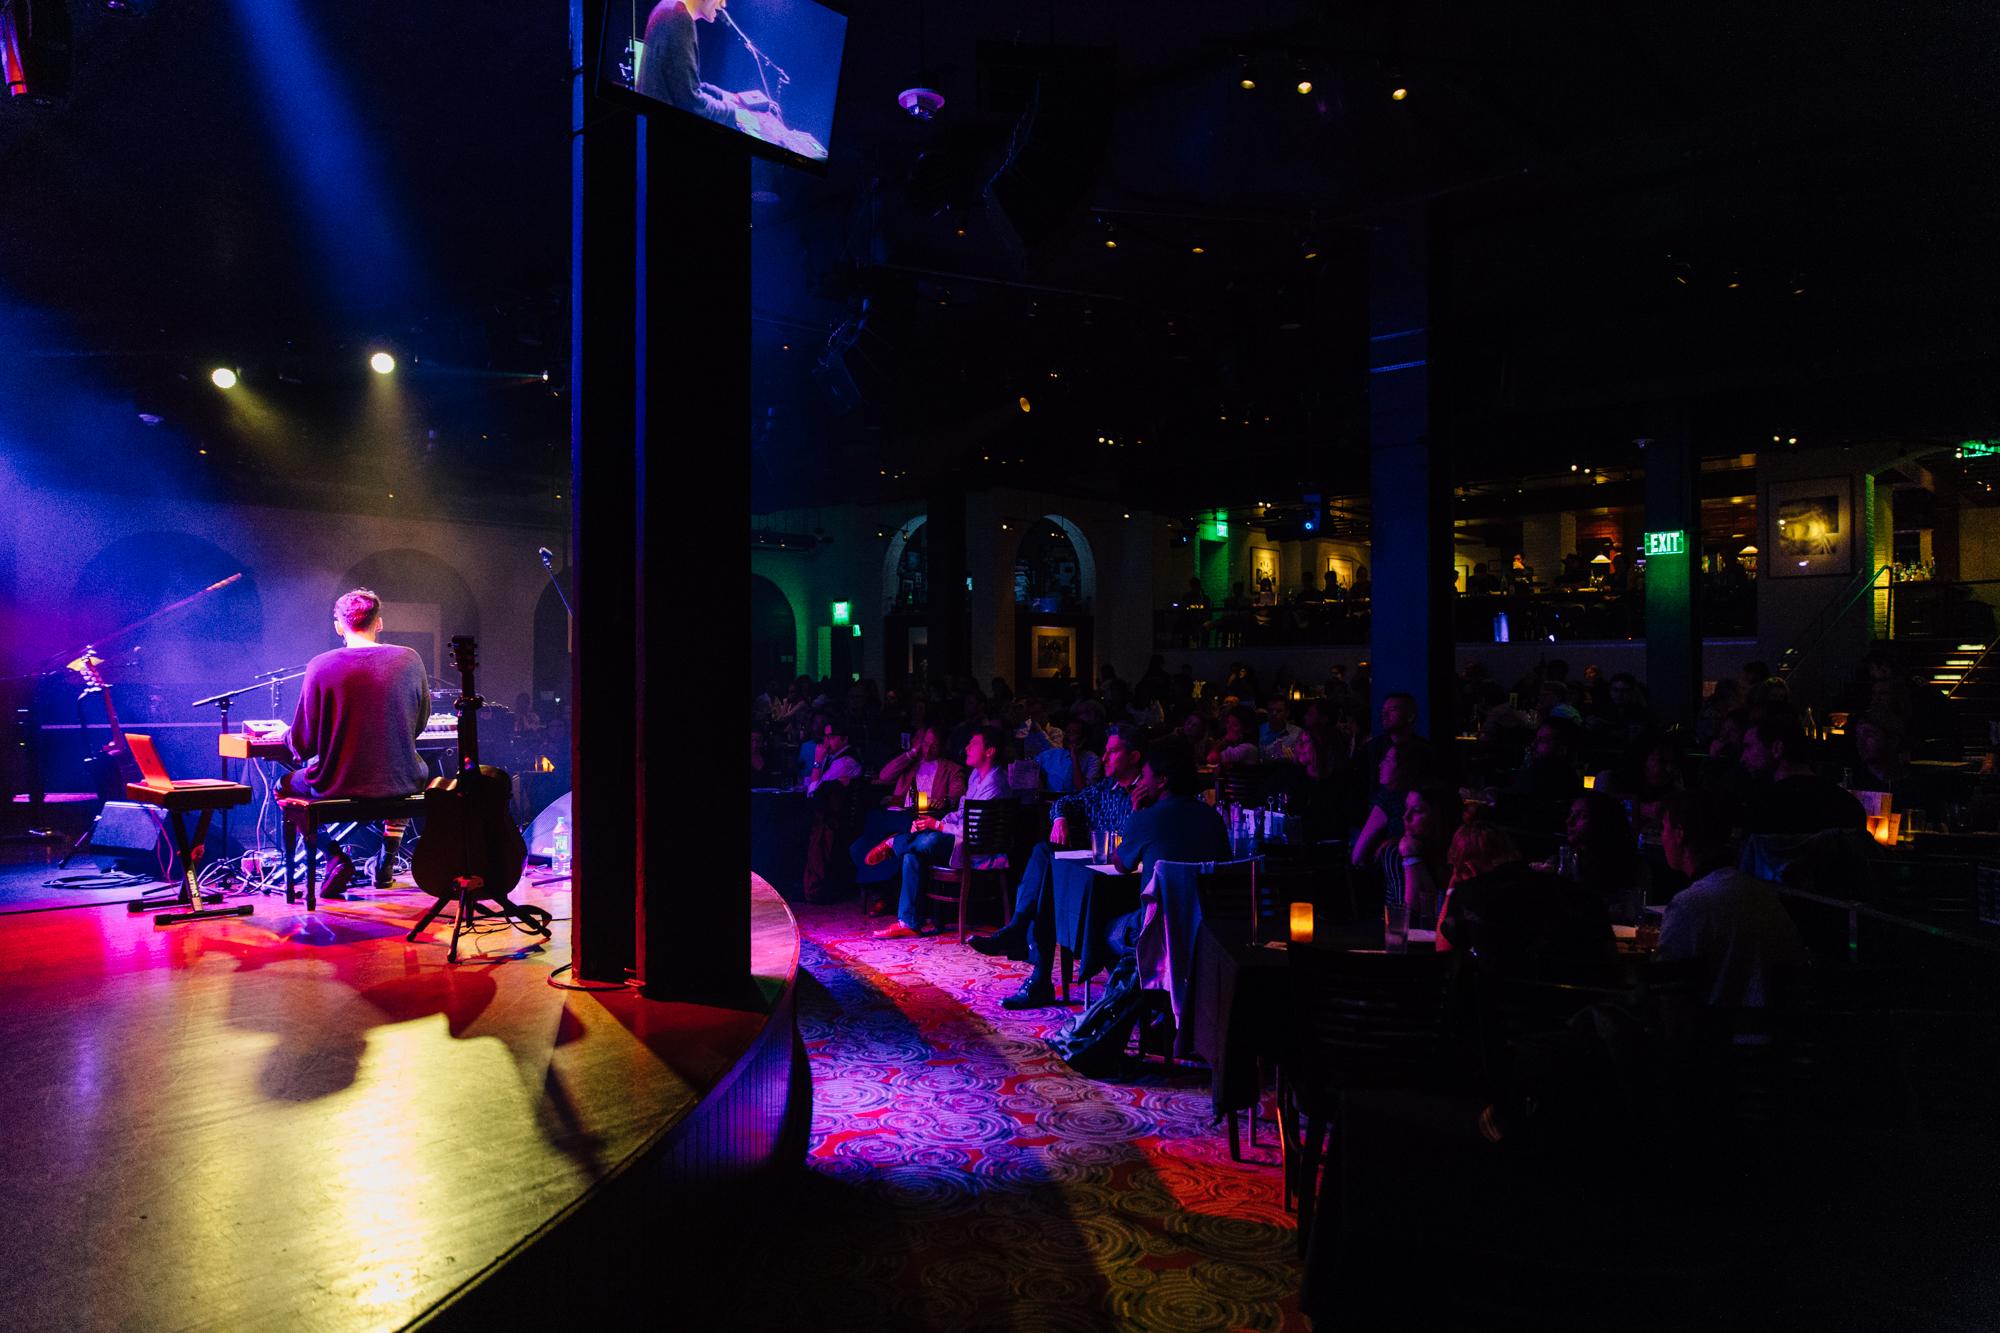 Shey Baba at The Hamilton (Photo by Mauricio Castro /  @themauricio )